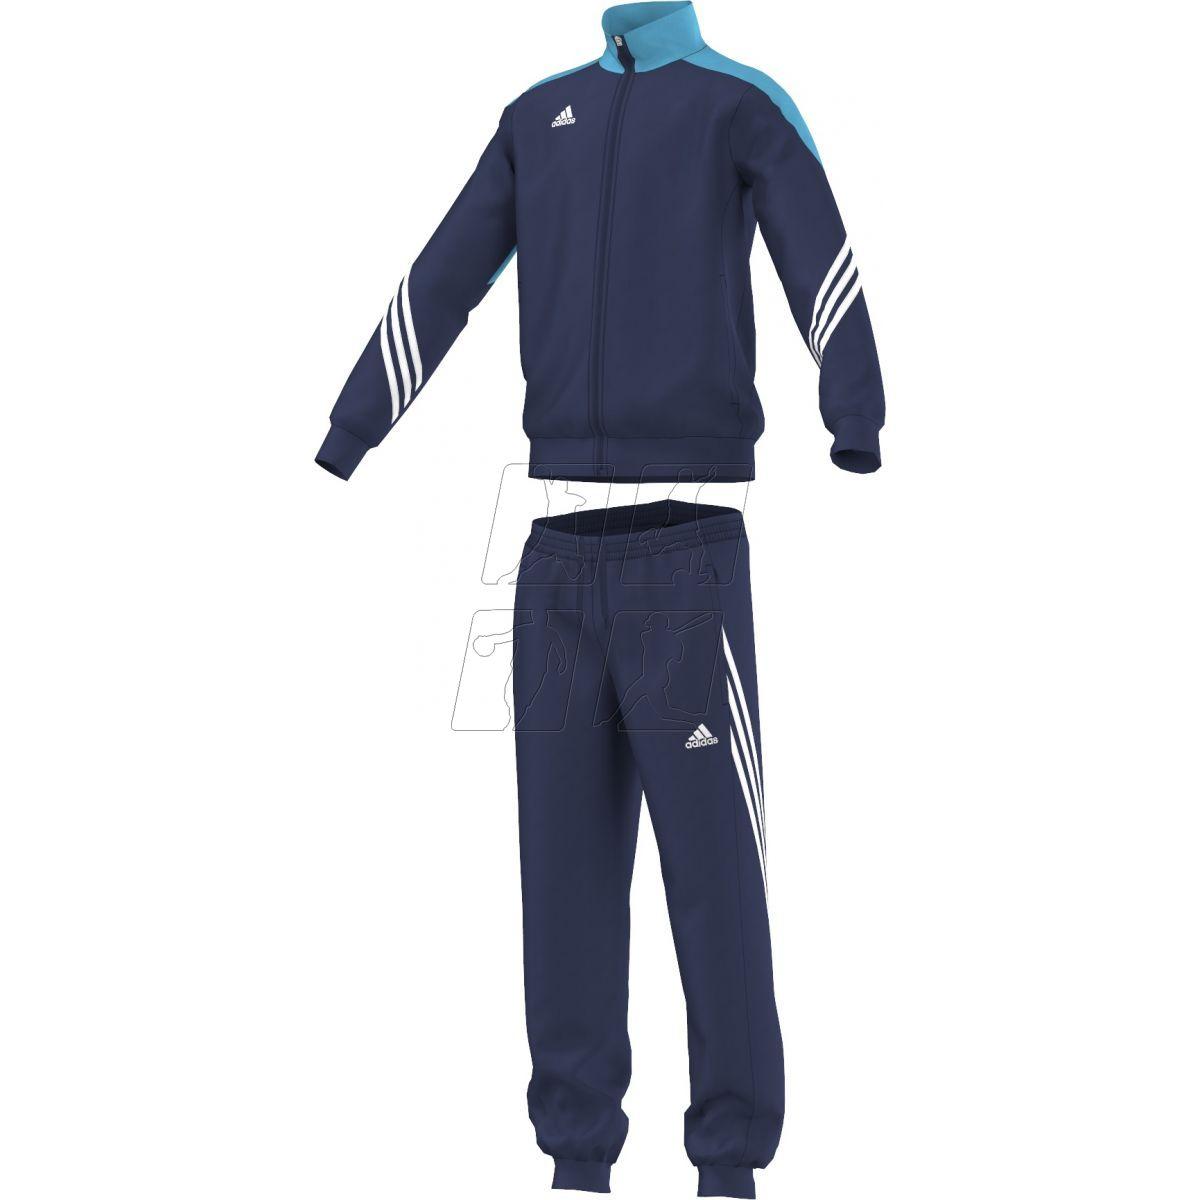 adidas Sereno 14 Junior Trainingsanzug nur für 25,99€